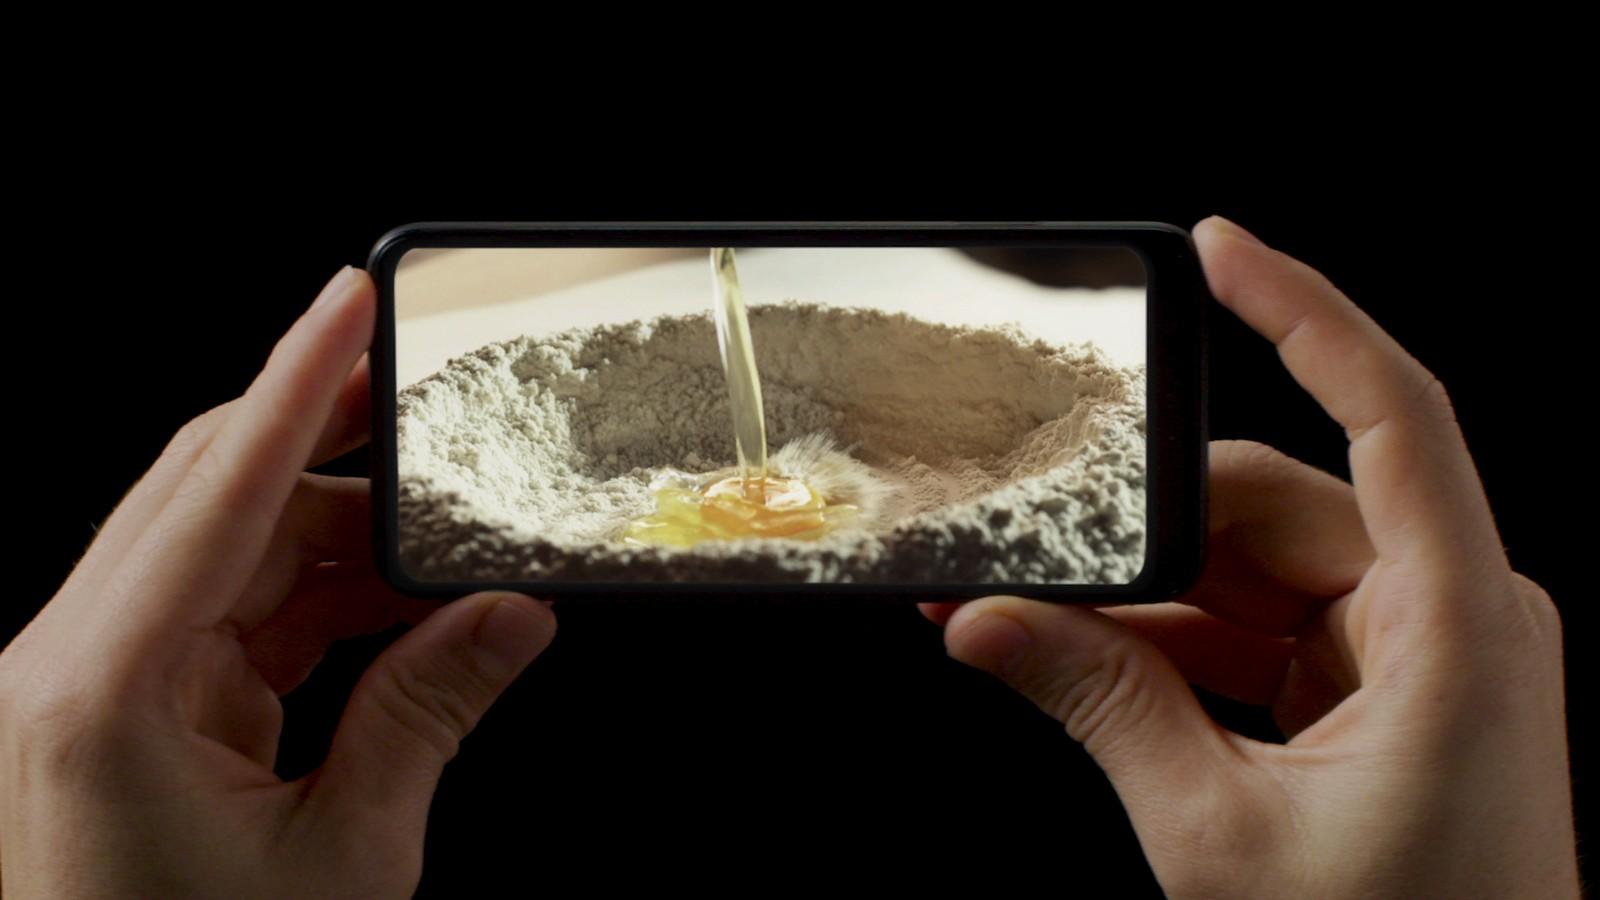 Quibi's secret weapon: Videos that work in portrait and landscape mode